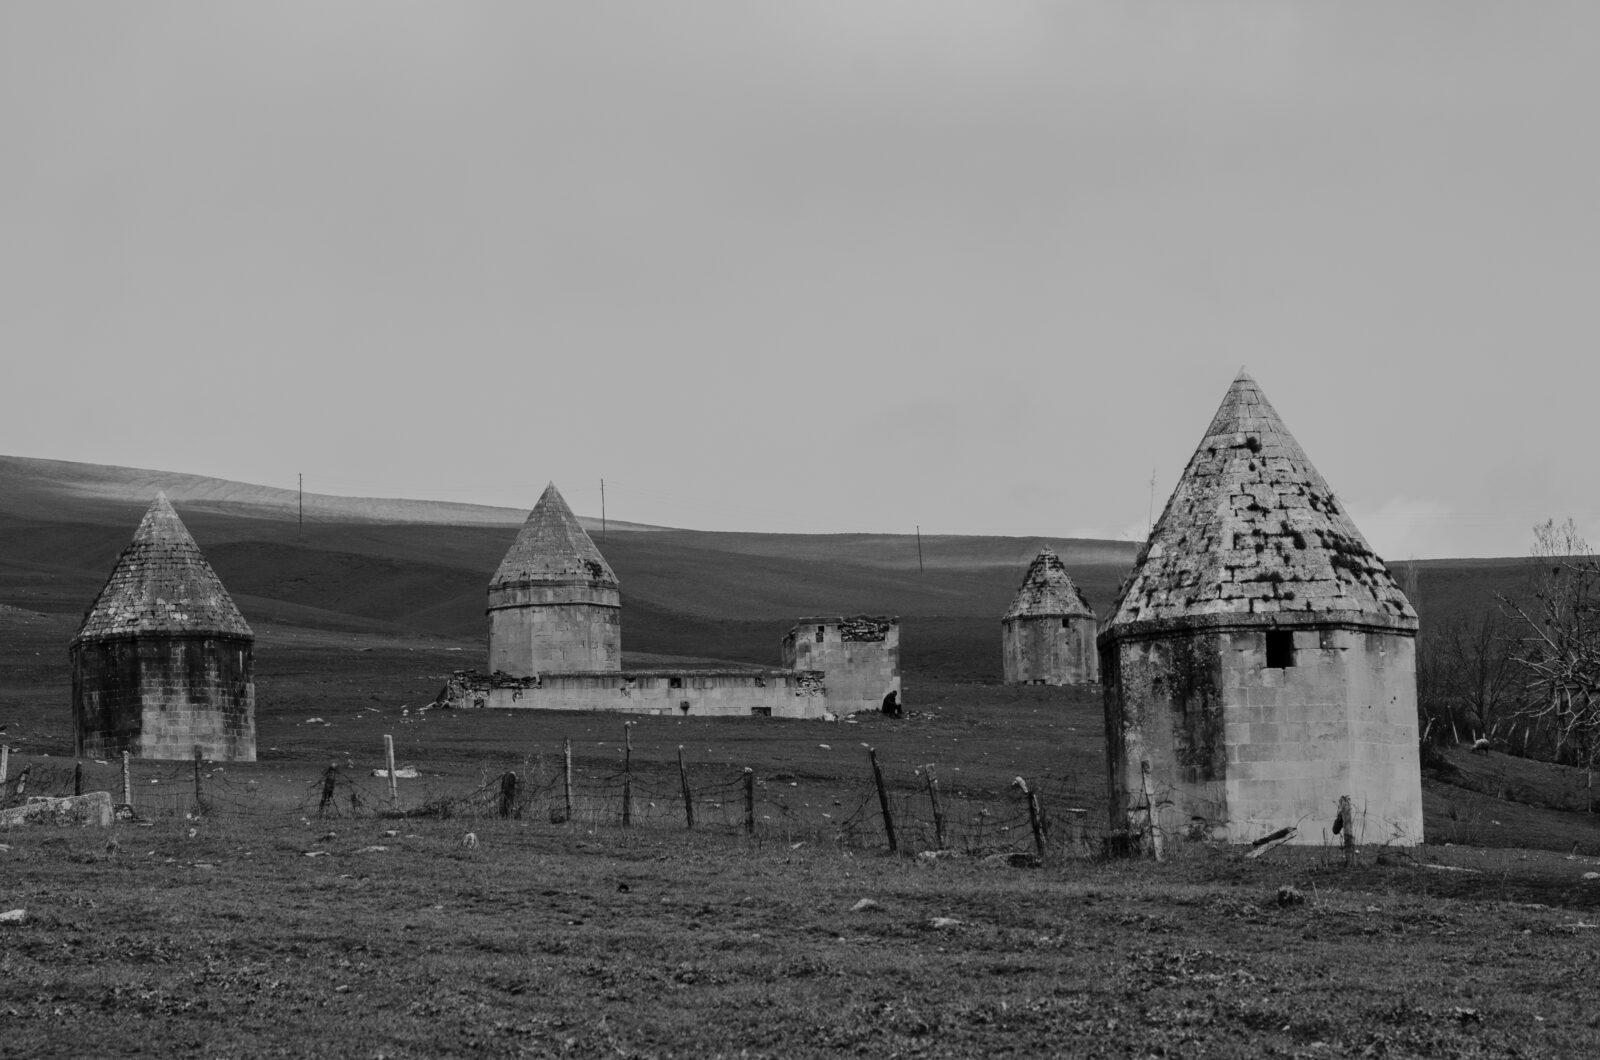 Sufi Shrines And Tombs In The District Raion Of Shamakhi Azerbaijan Shamaxı Kələxana Türbələri Image Was Kindly Provided By Well Known Azeri